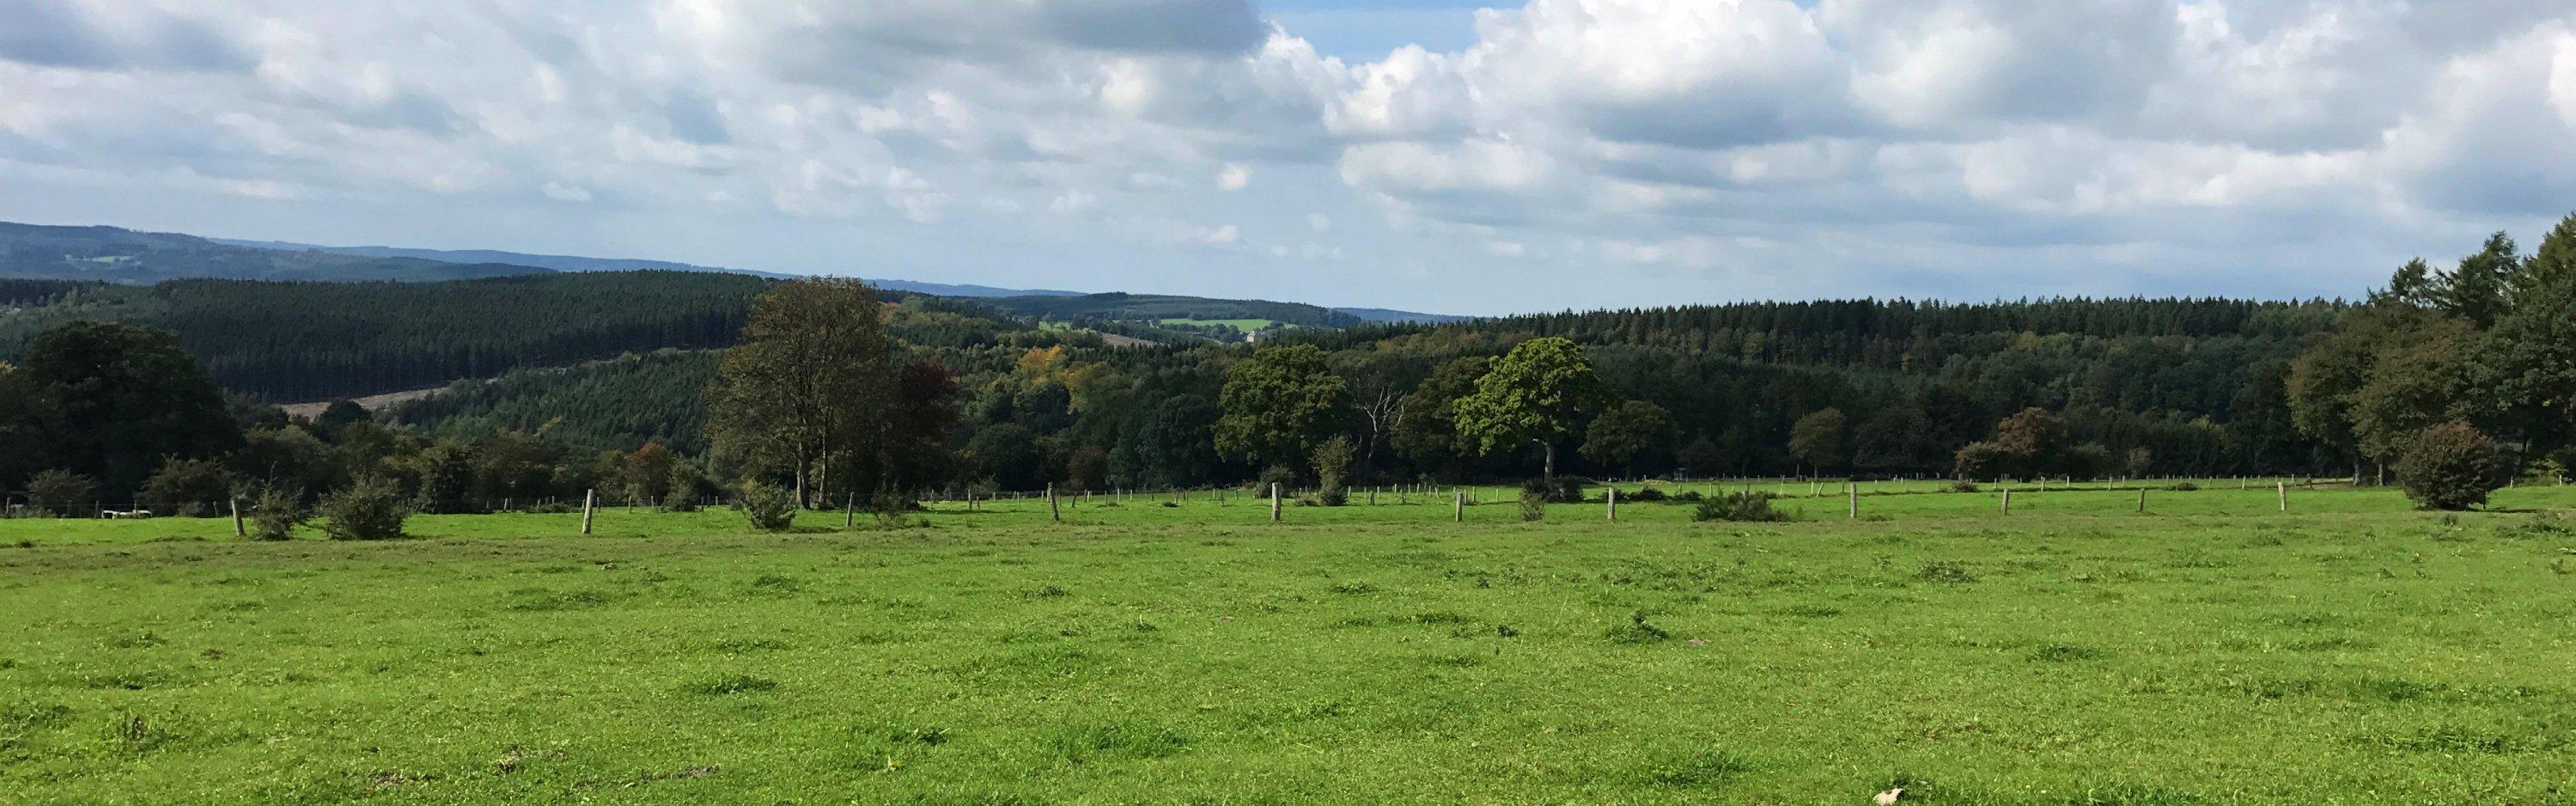 Ardennen nabij Vielsalm - Laurens Steijn